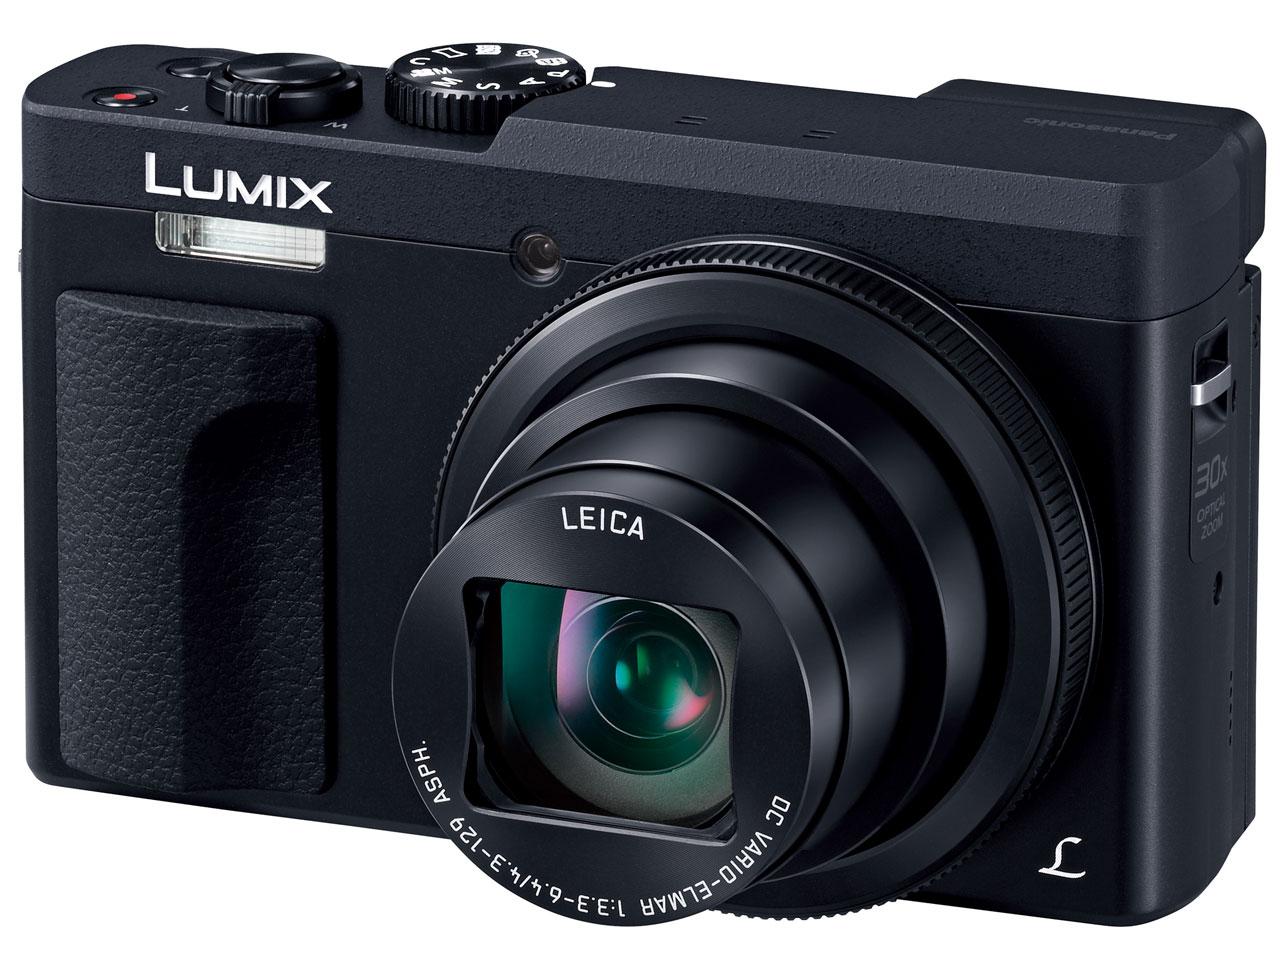 LUMIX DC-TZ90-K [ブラック] 通常配送商品